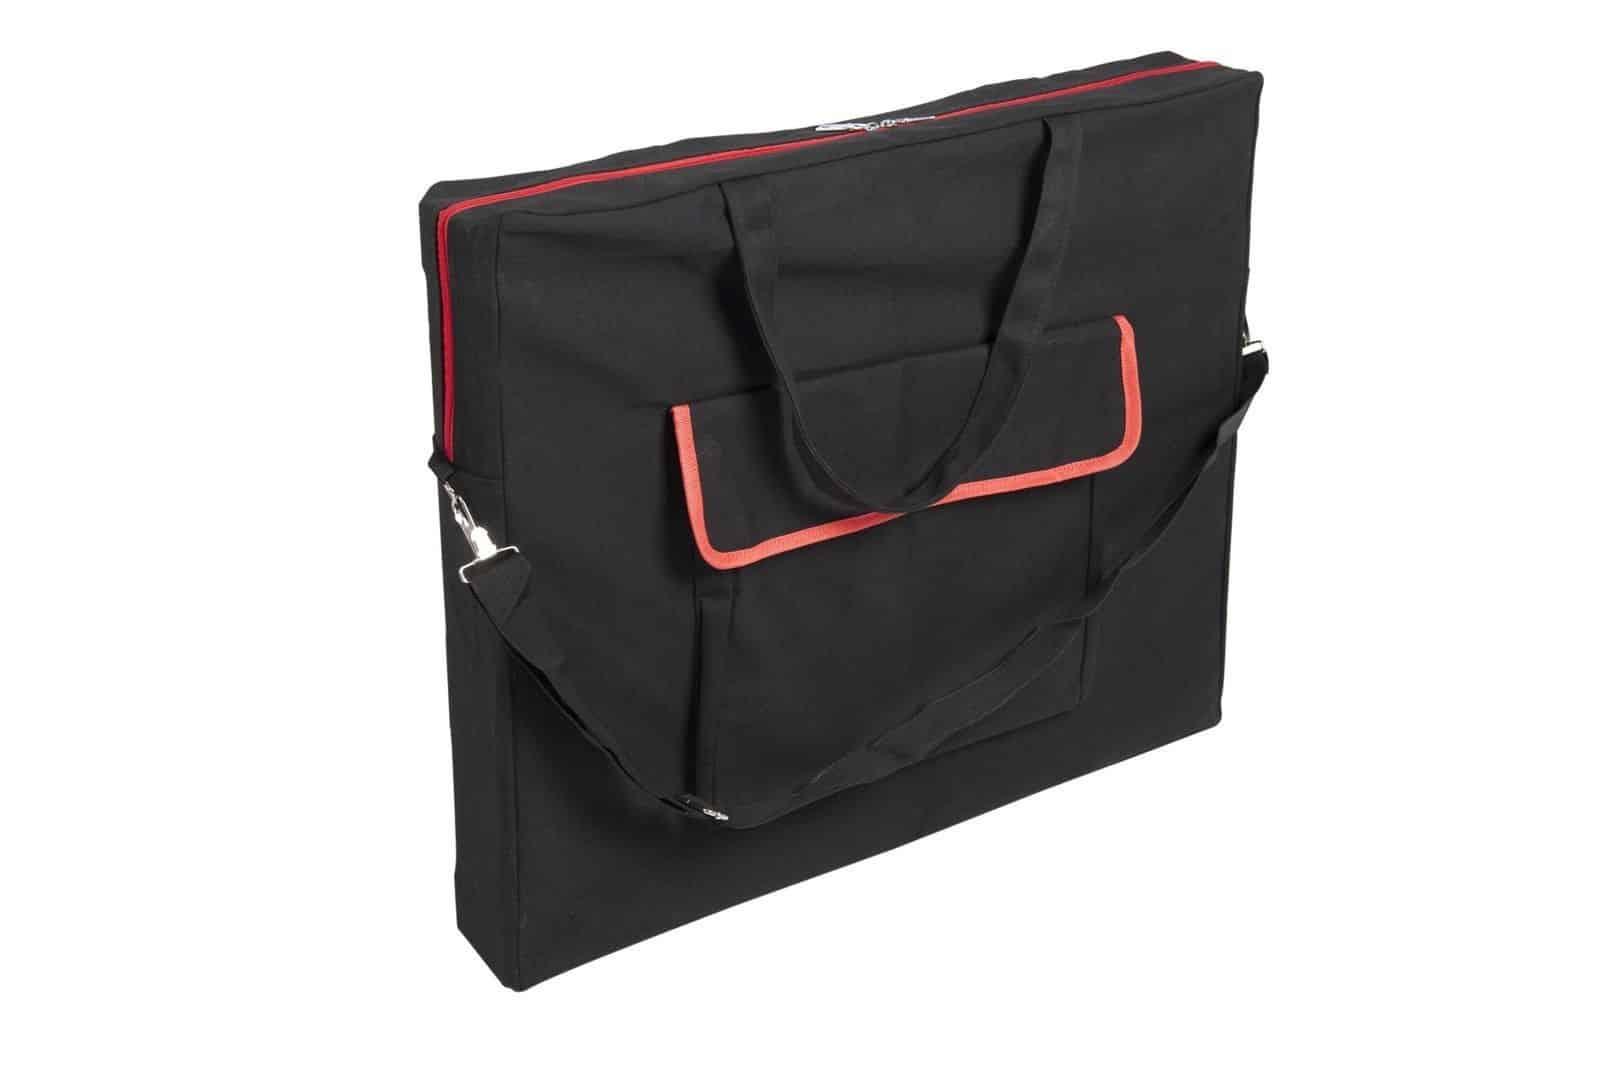 80W Beaut opklapbaar daglichtpaneel set in koffer 12 Volt-2747